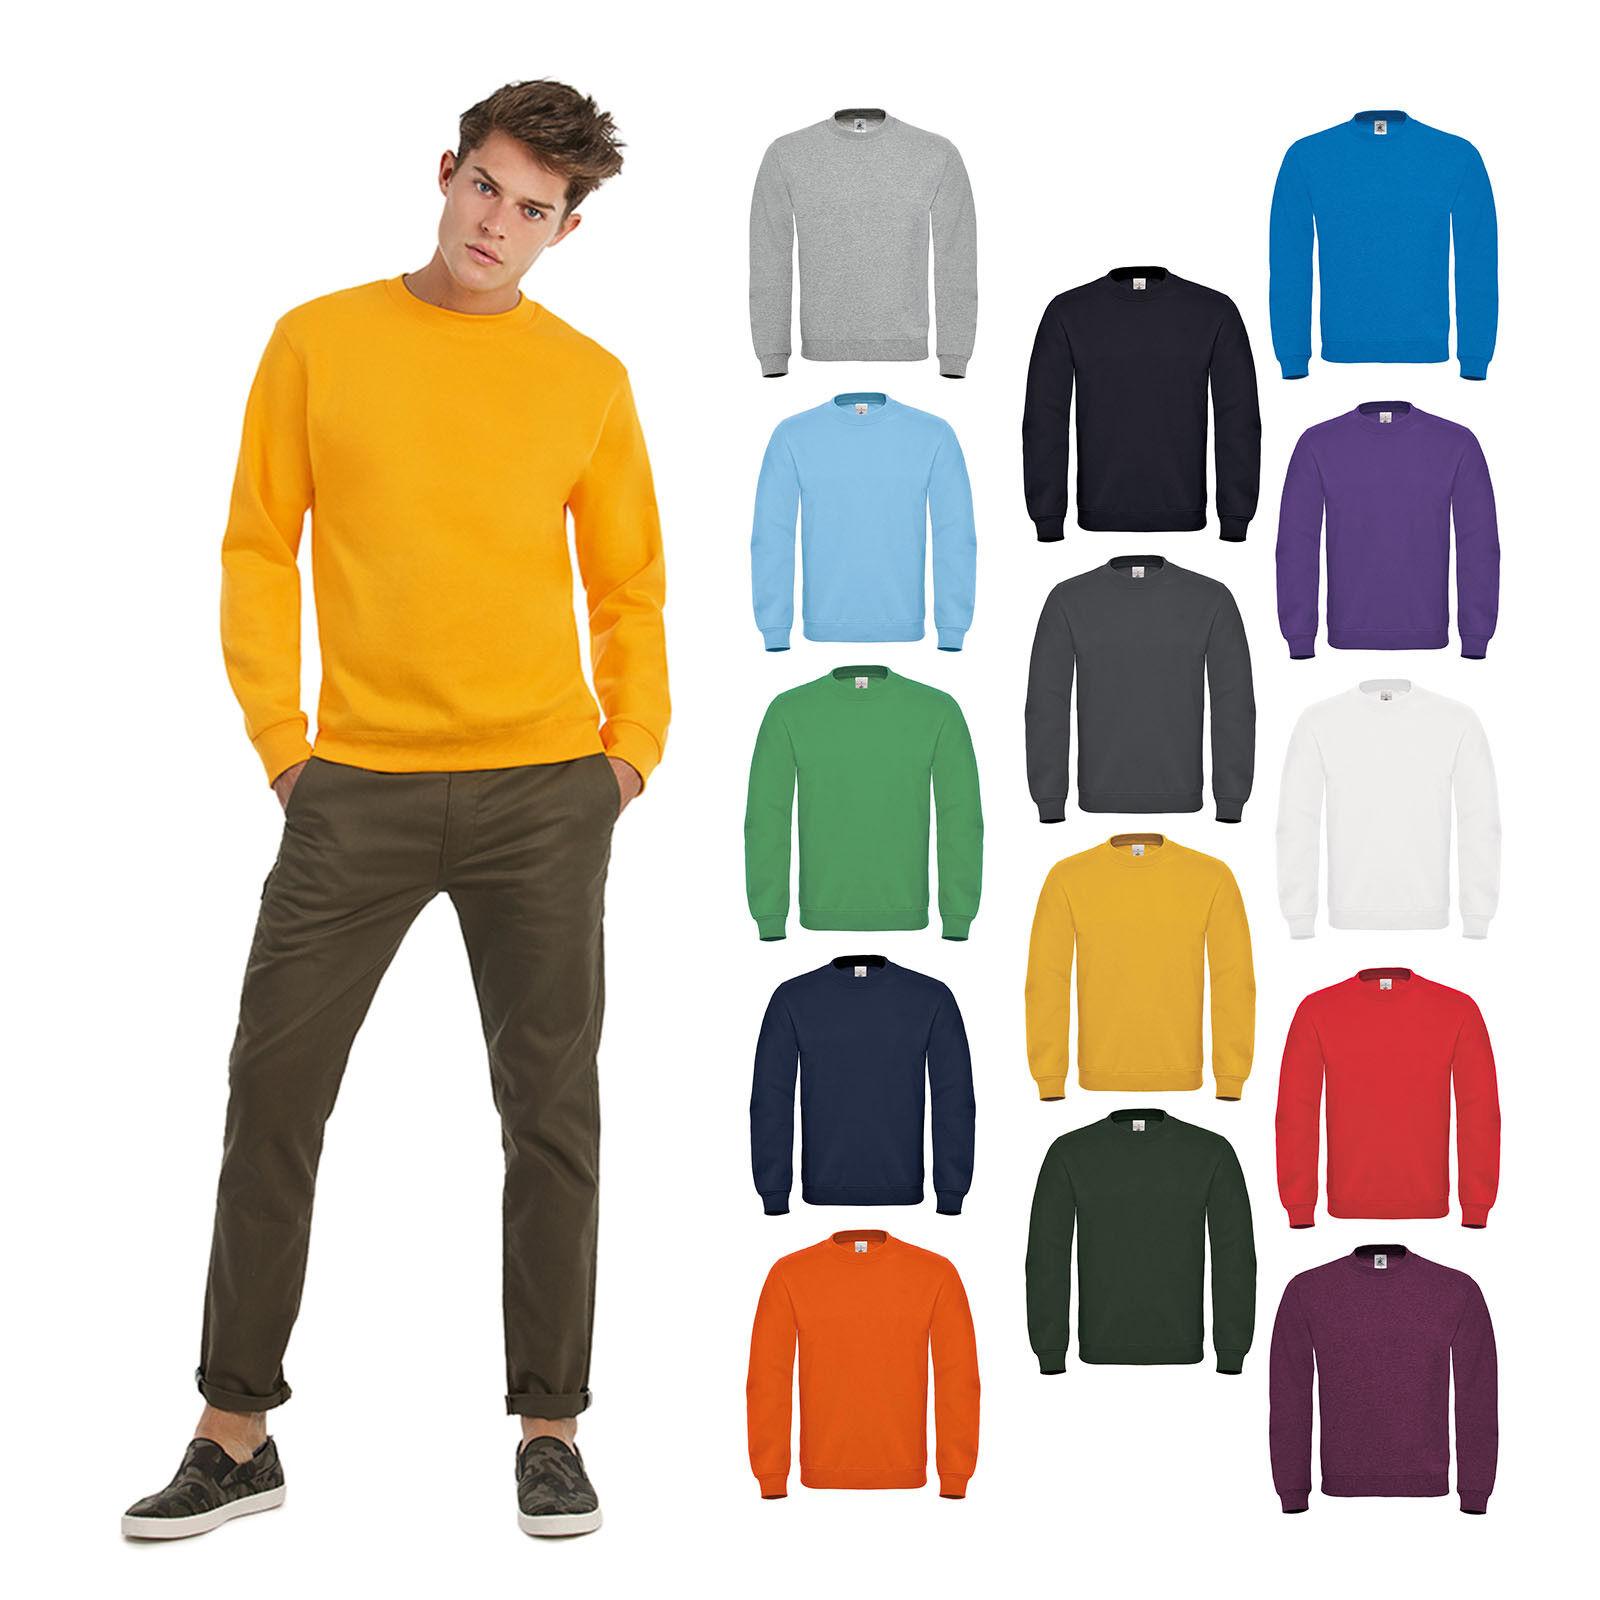 B&C Collection ID.002 Sweatshirt WU120 - Plain Fleece Cotton Jumper Crew Neck